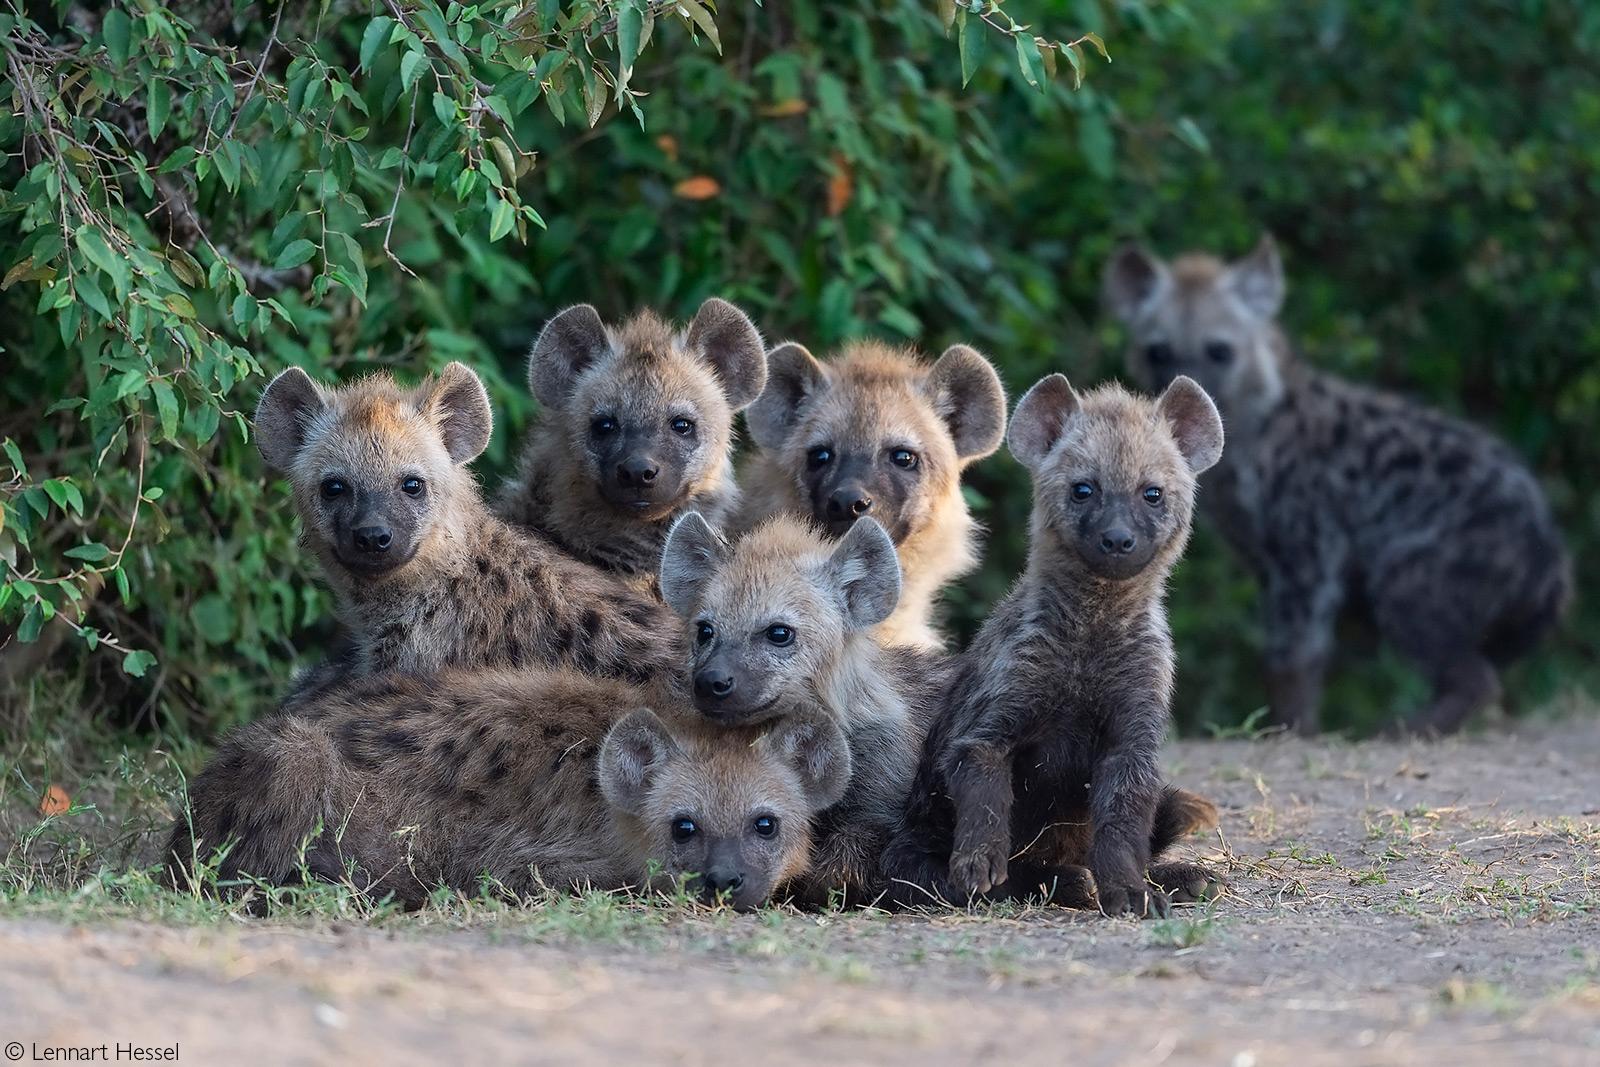 A pile of young spotted hyenas. Maasai Mara National Reserve, Kenya © Lennart Hessel